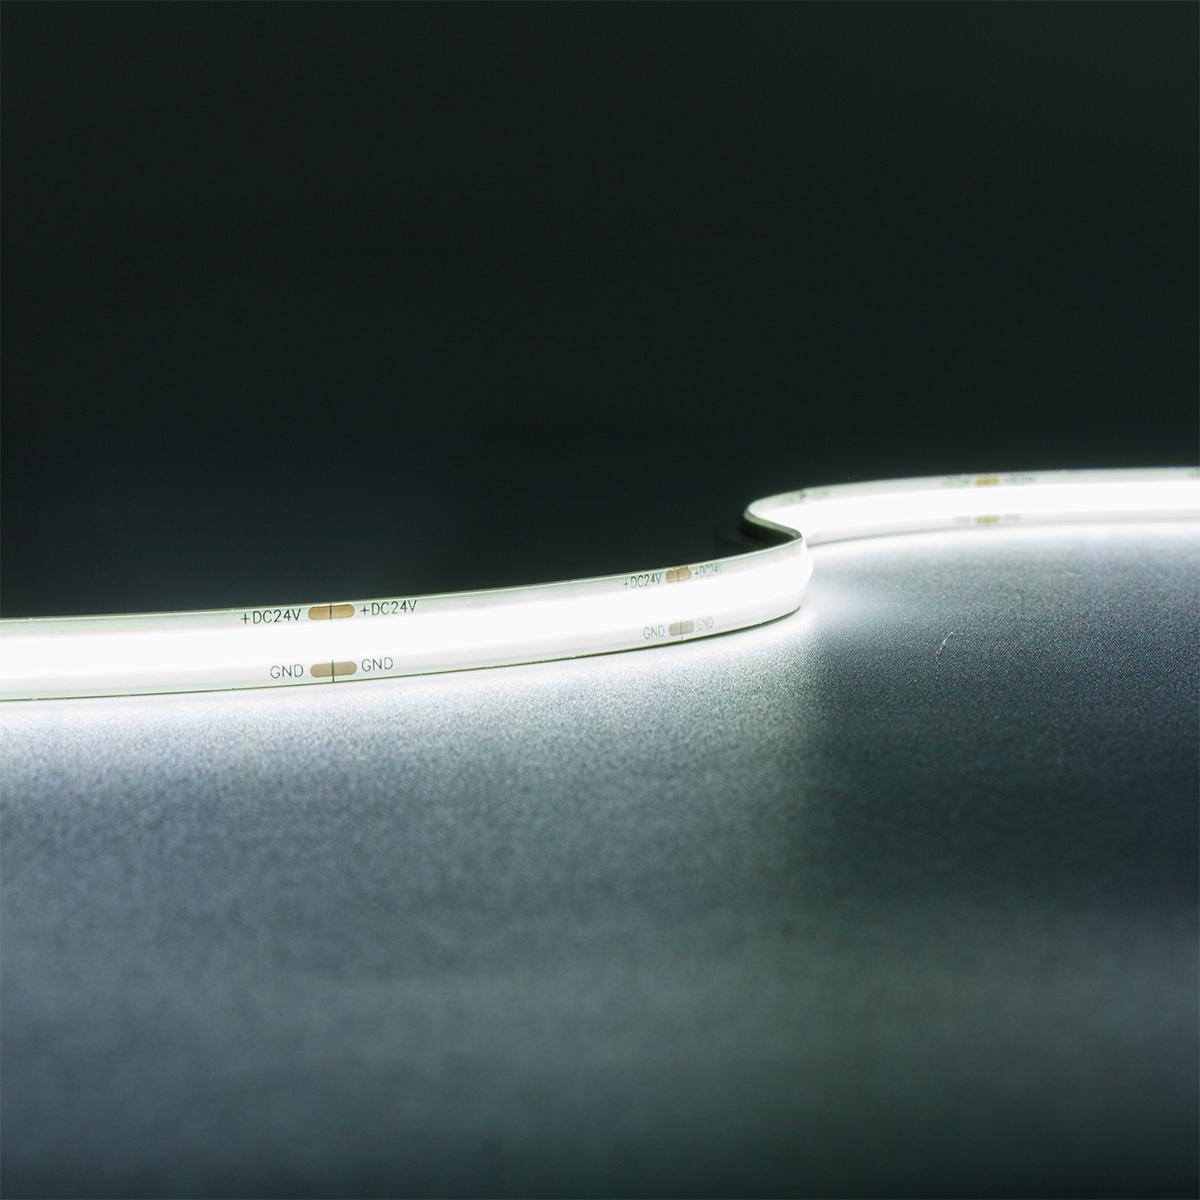 COB Kaltweiß 24V LED Streifen 5M 10W/m 528LED/m 8mm IP65 6000K